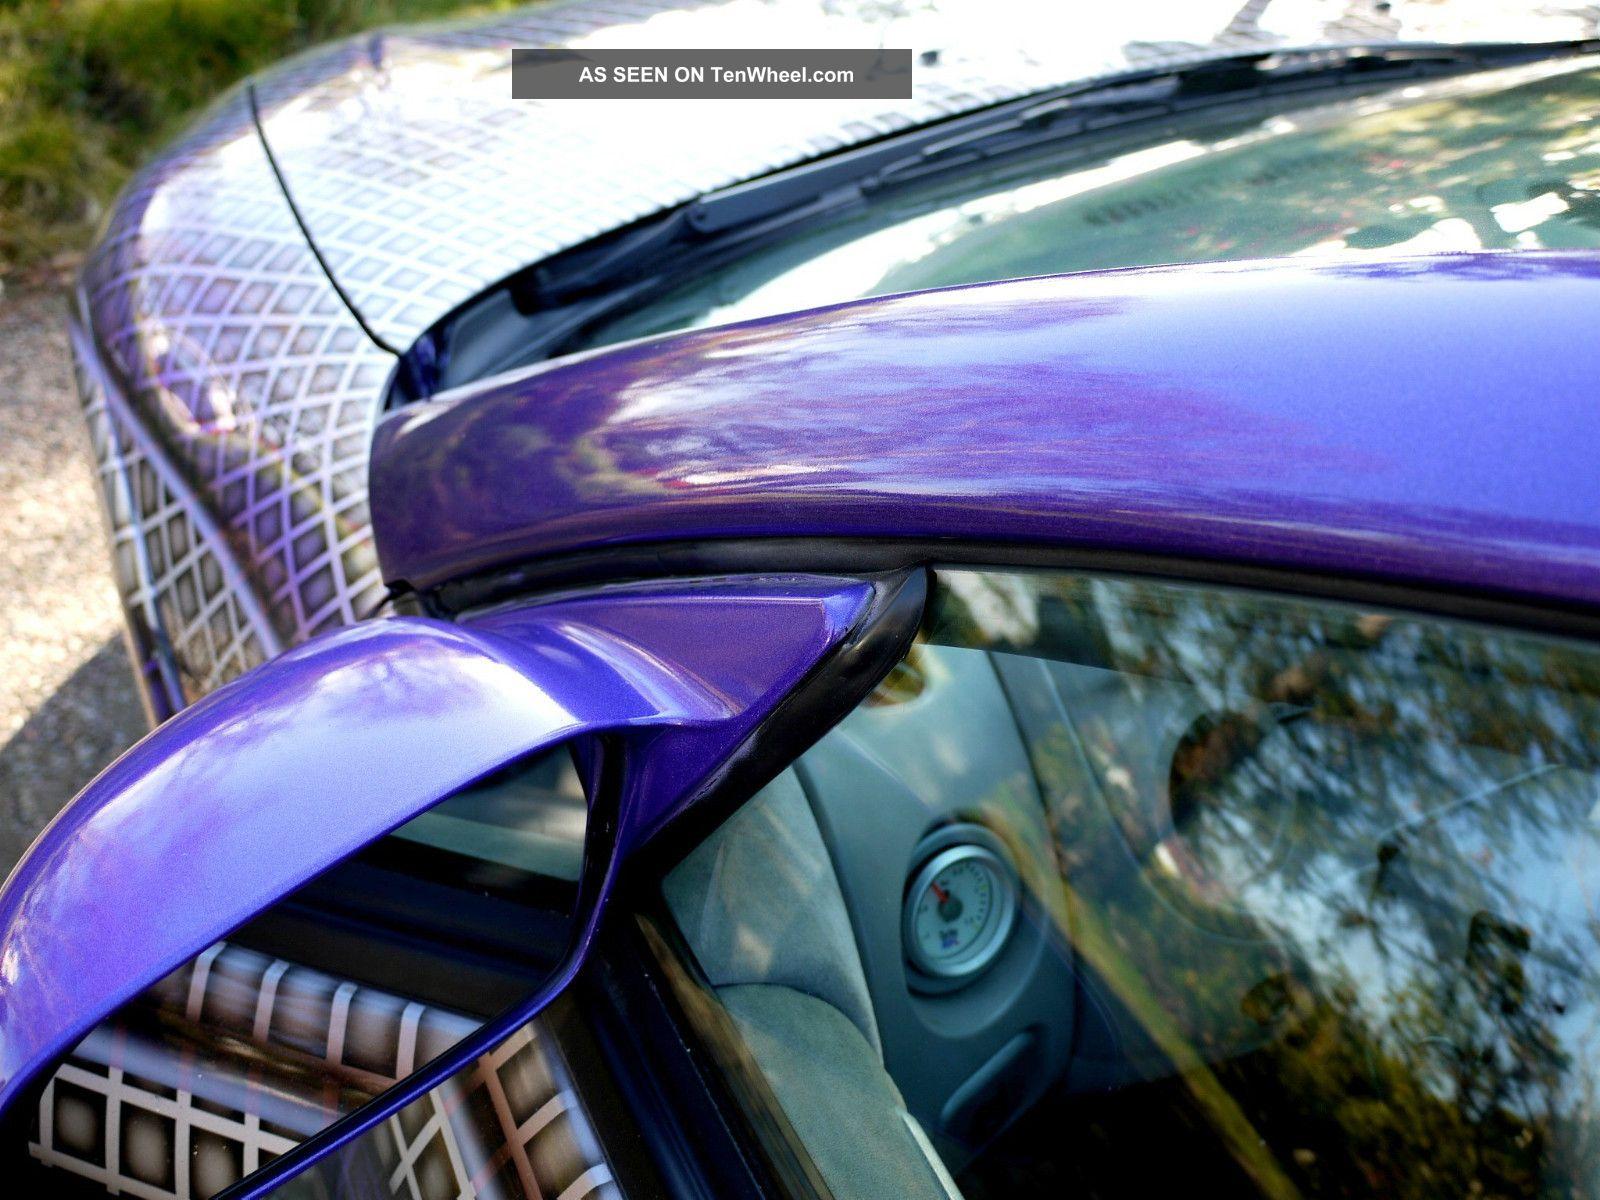 2003 Mitsubishi Eclipse Spyder Gts >> Fast & Furious 2003 Mitsubishi Eclipse Spyder Gts